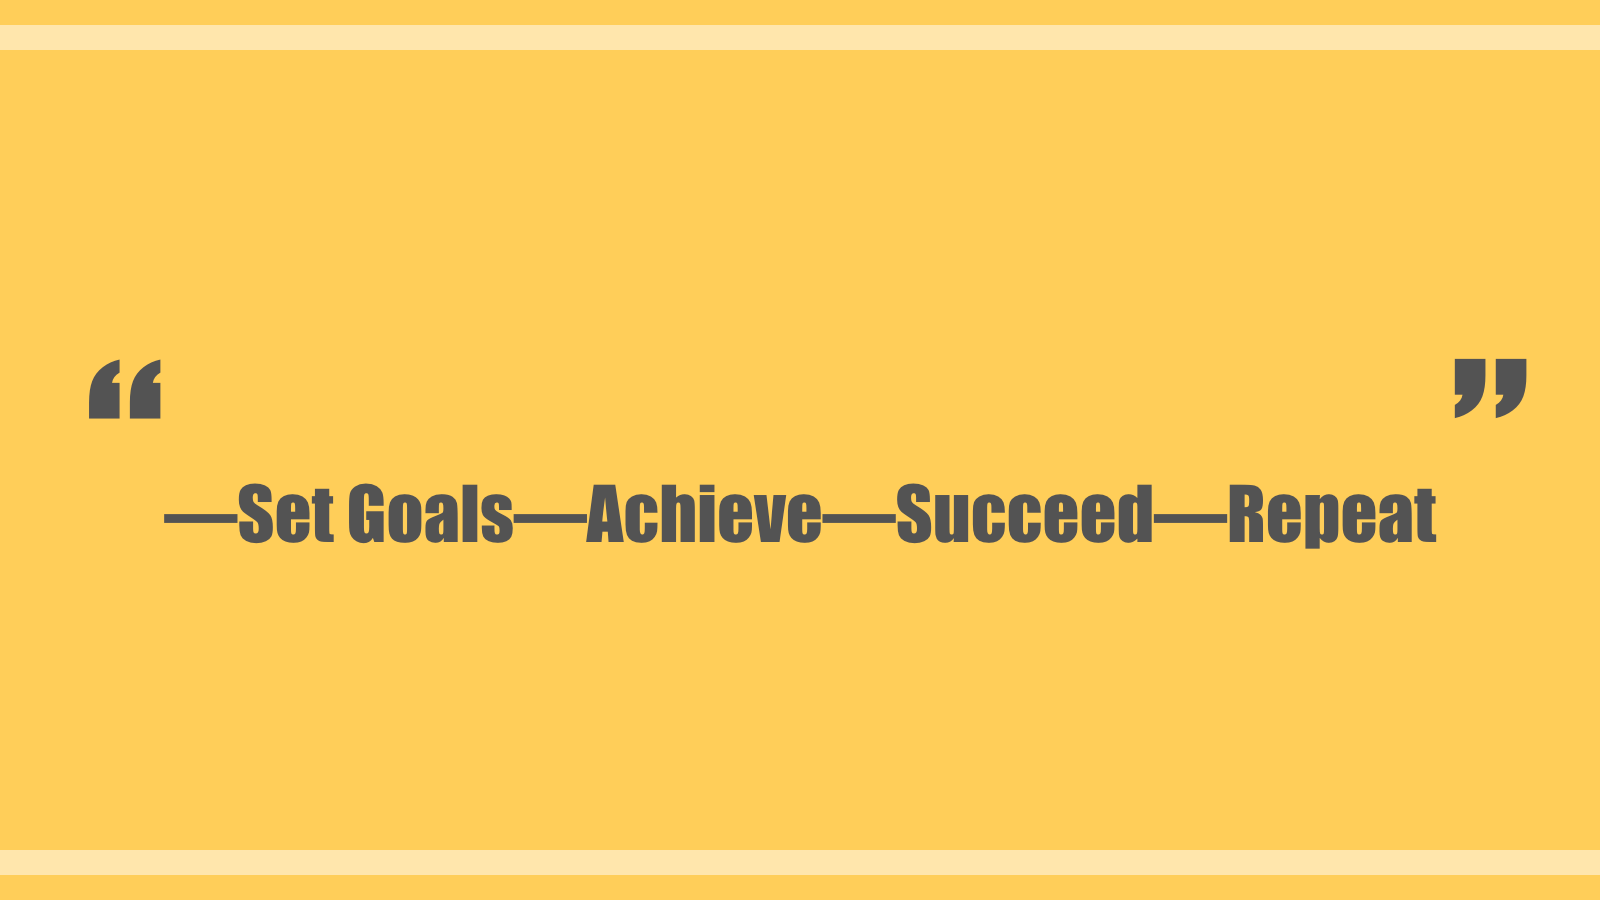 Set Goals Achieve Succeed Repeat.png